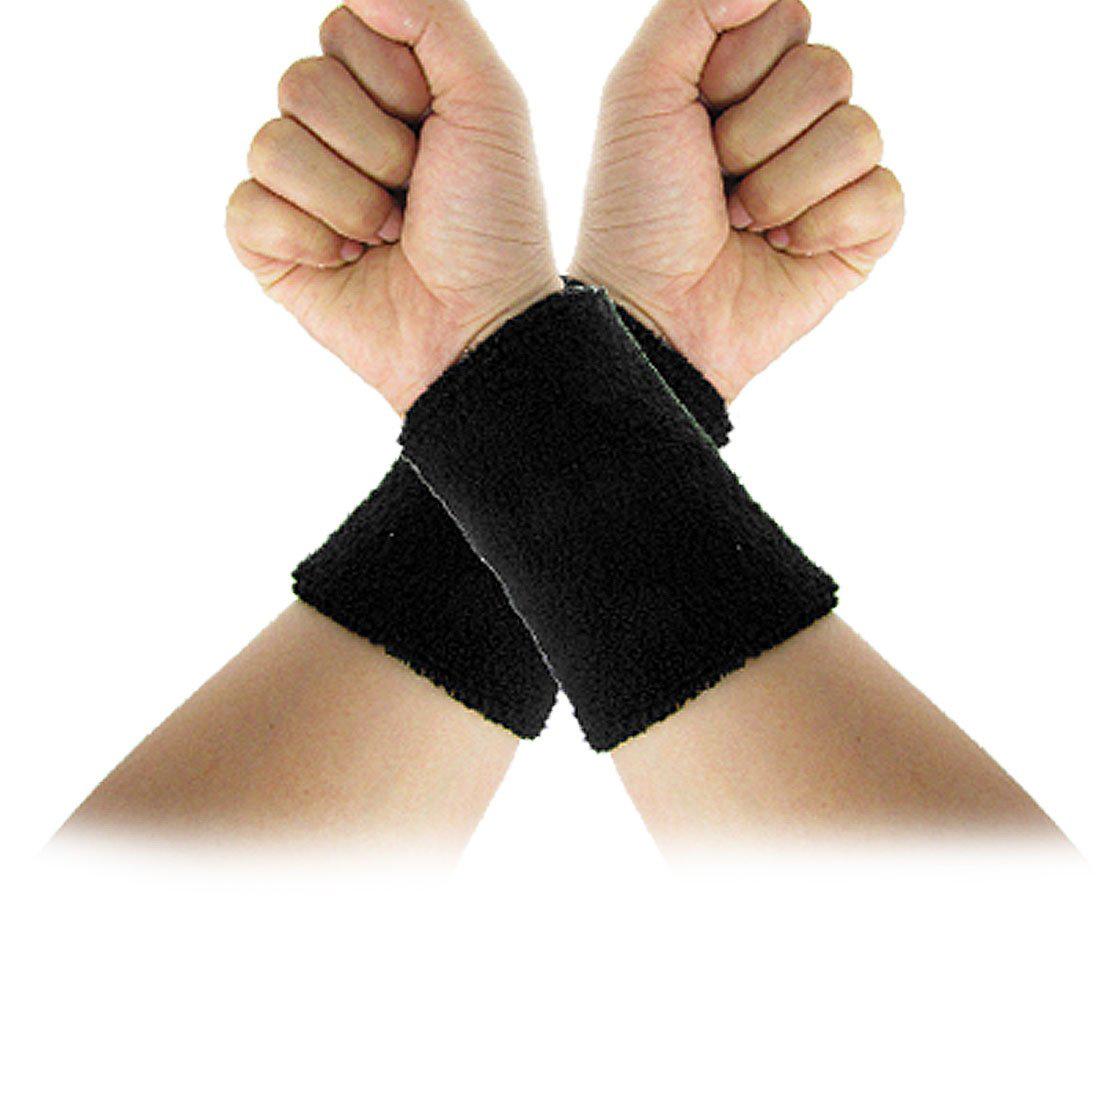 New Gift Black Elastic Terry Wrist Sweatband Sports Support 2Pcs(China (Mainland))